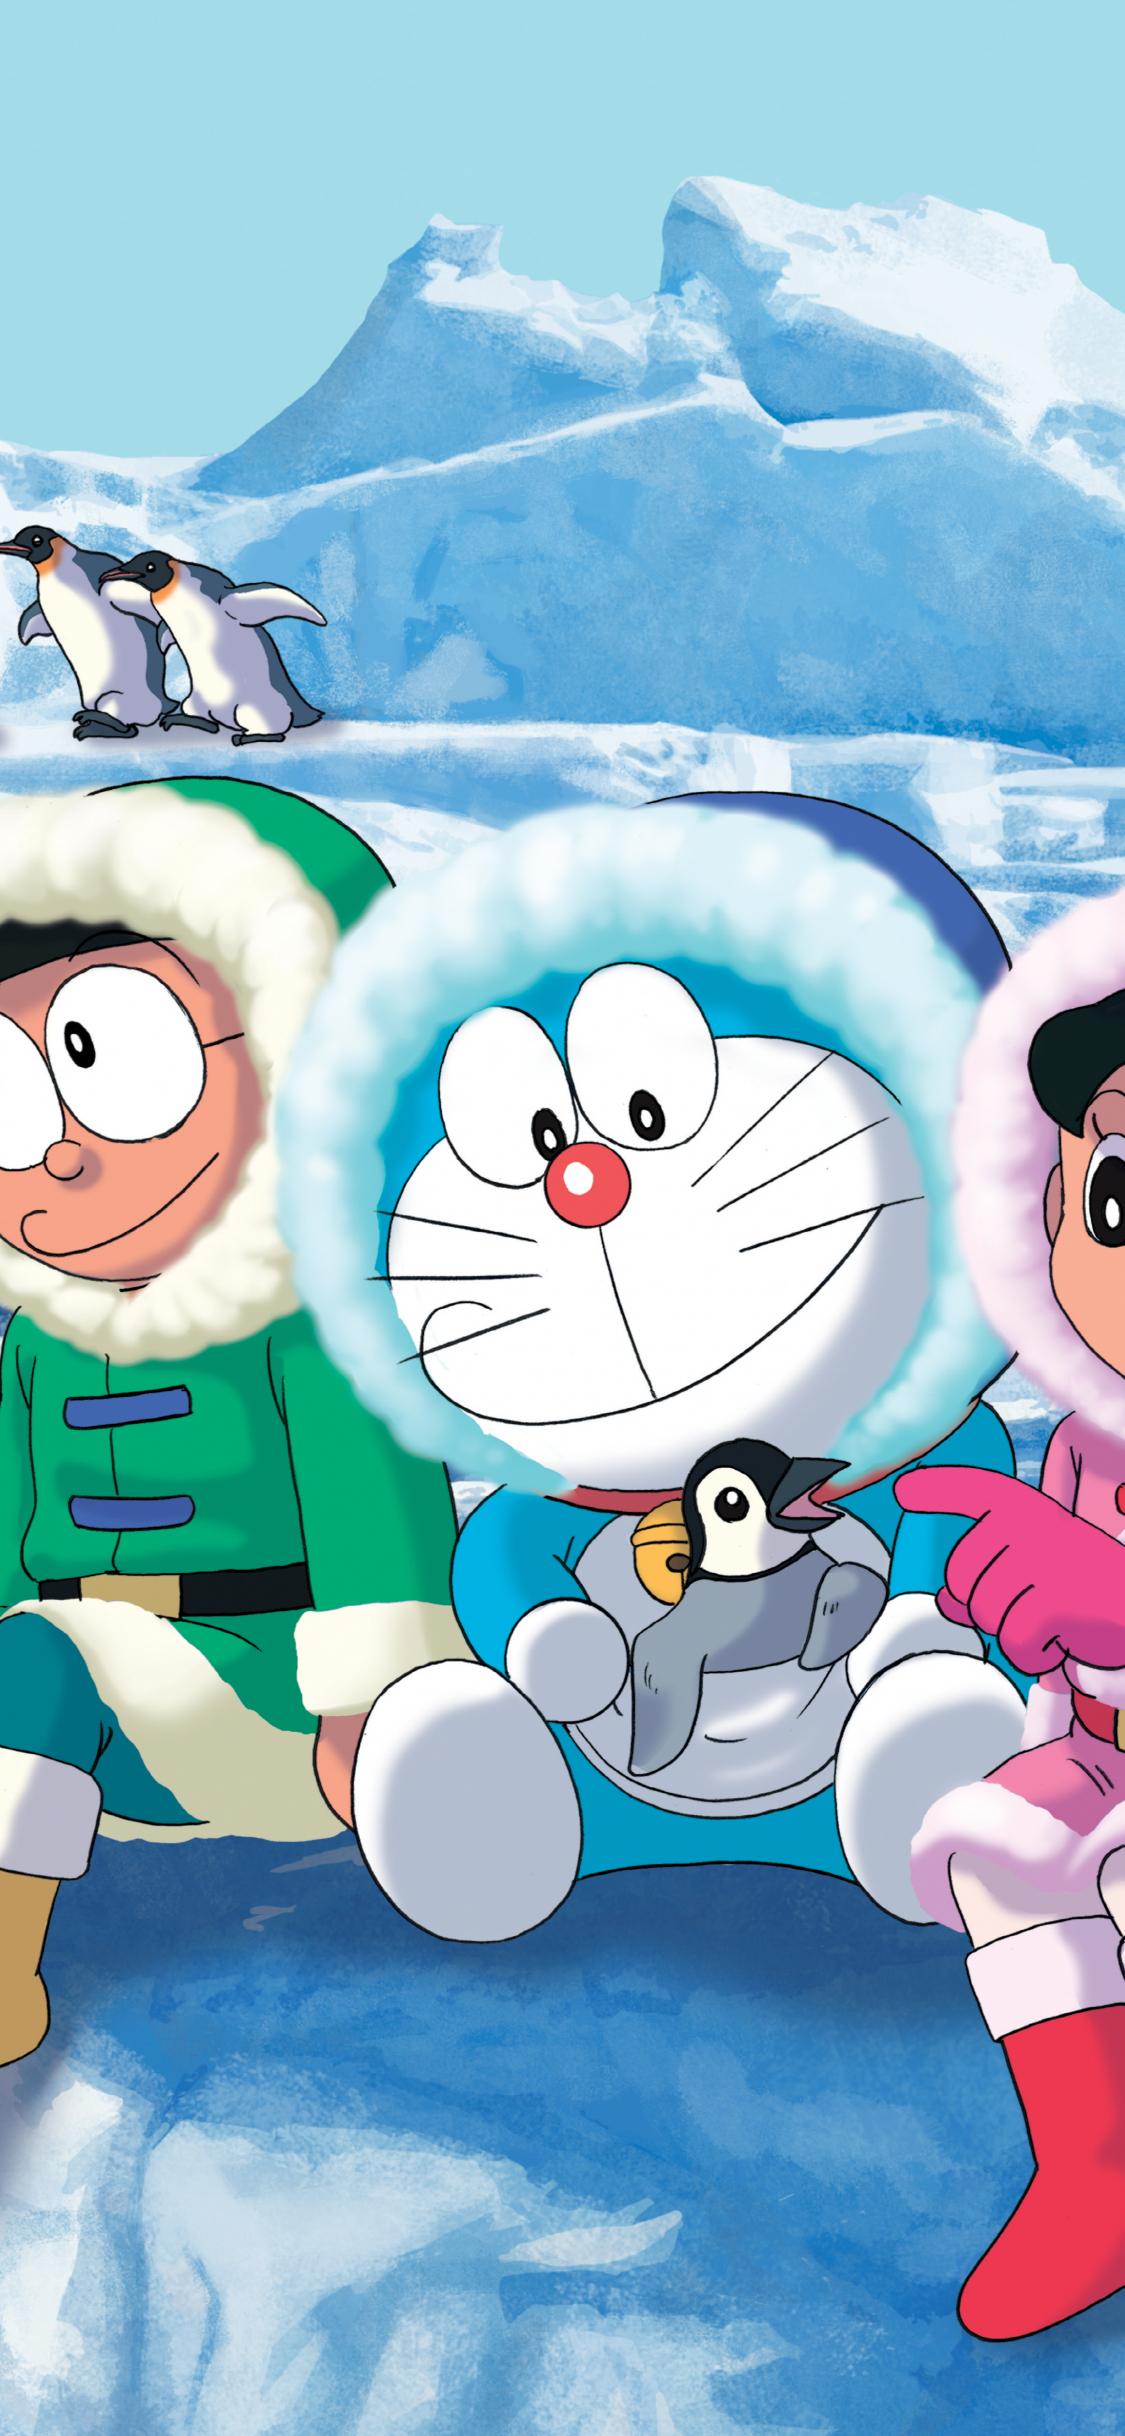 Free Doraemon Wallpaper Image Size 5370x4751px